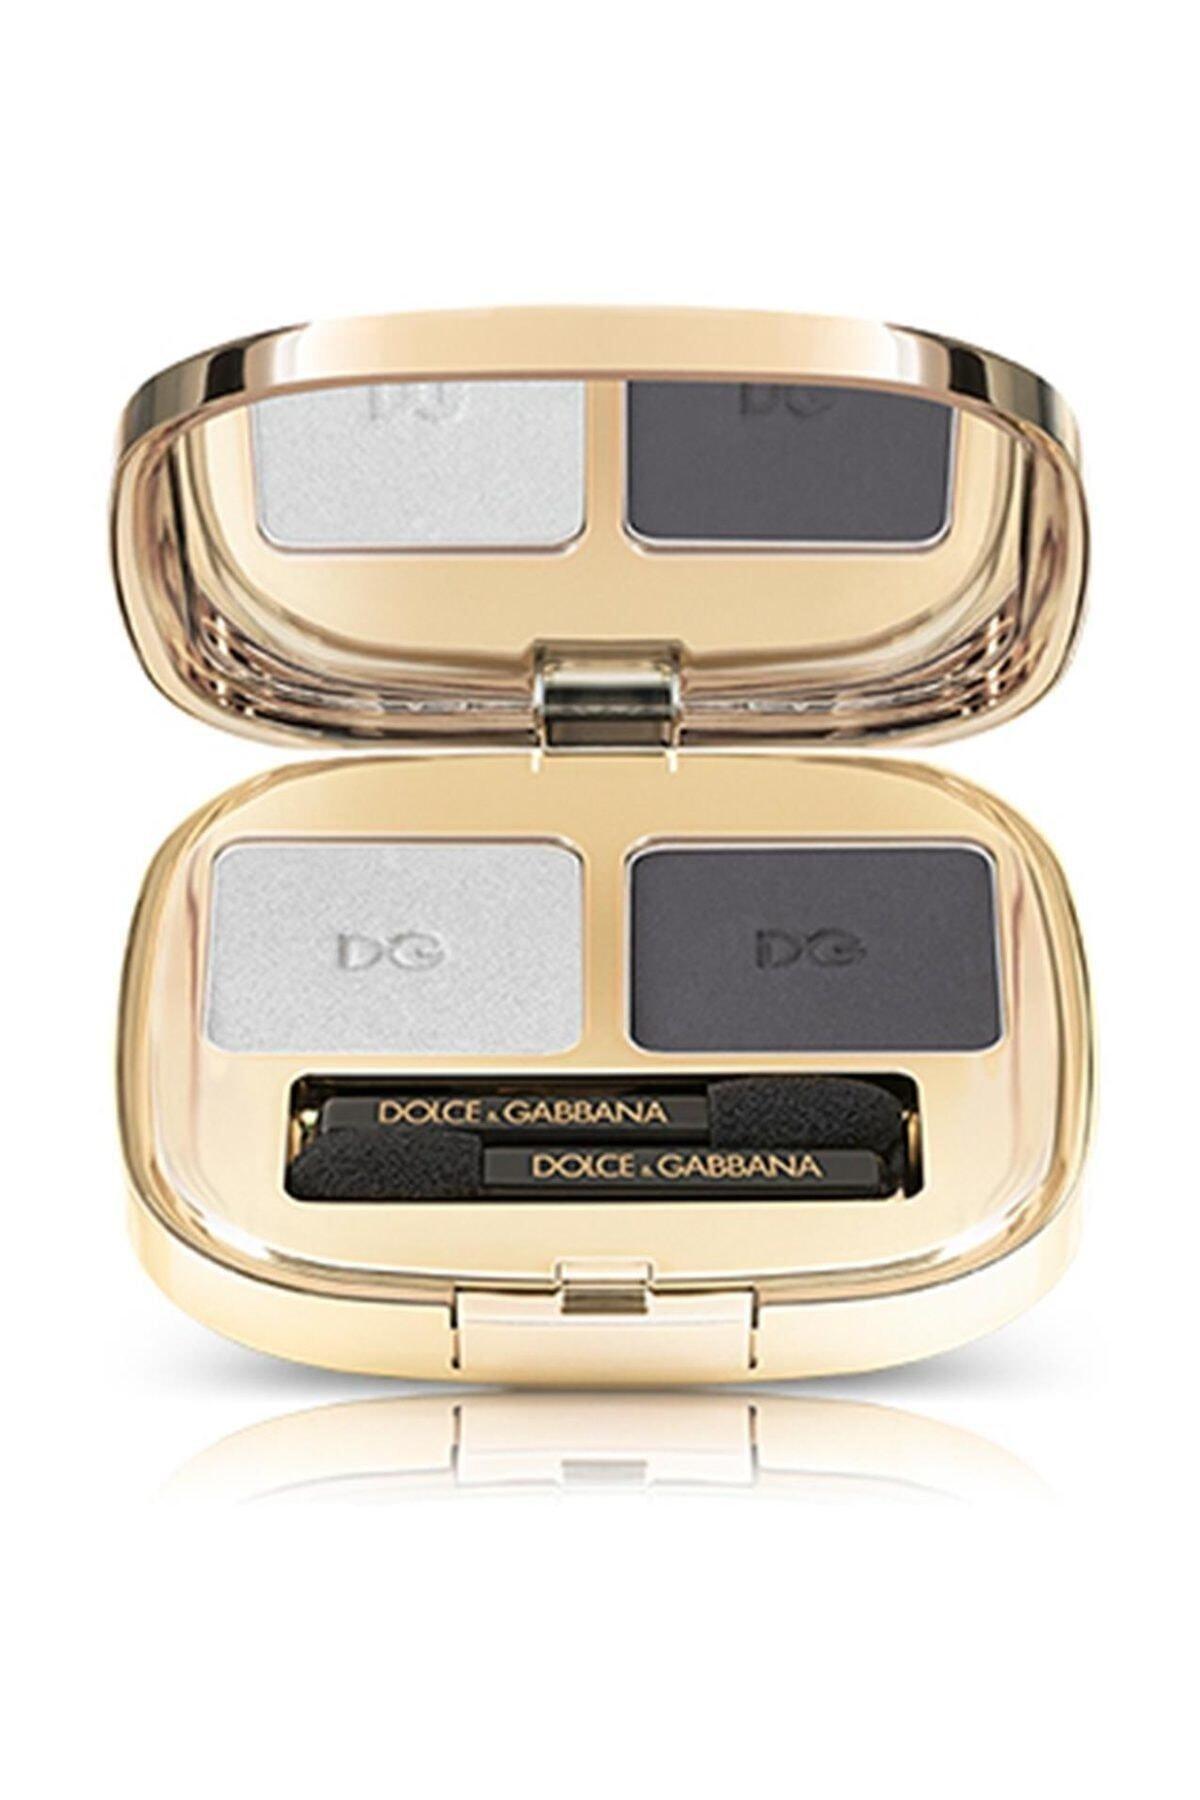 Dolce Gabbana Smooth Eyeshadow Duo 115 Femme Fatale Göz Farı 737052960296 1